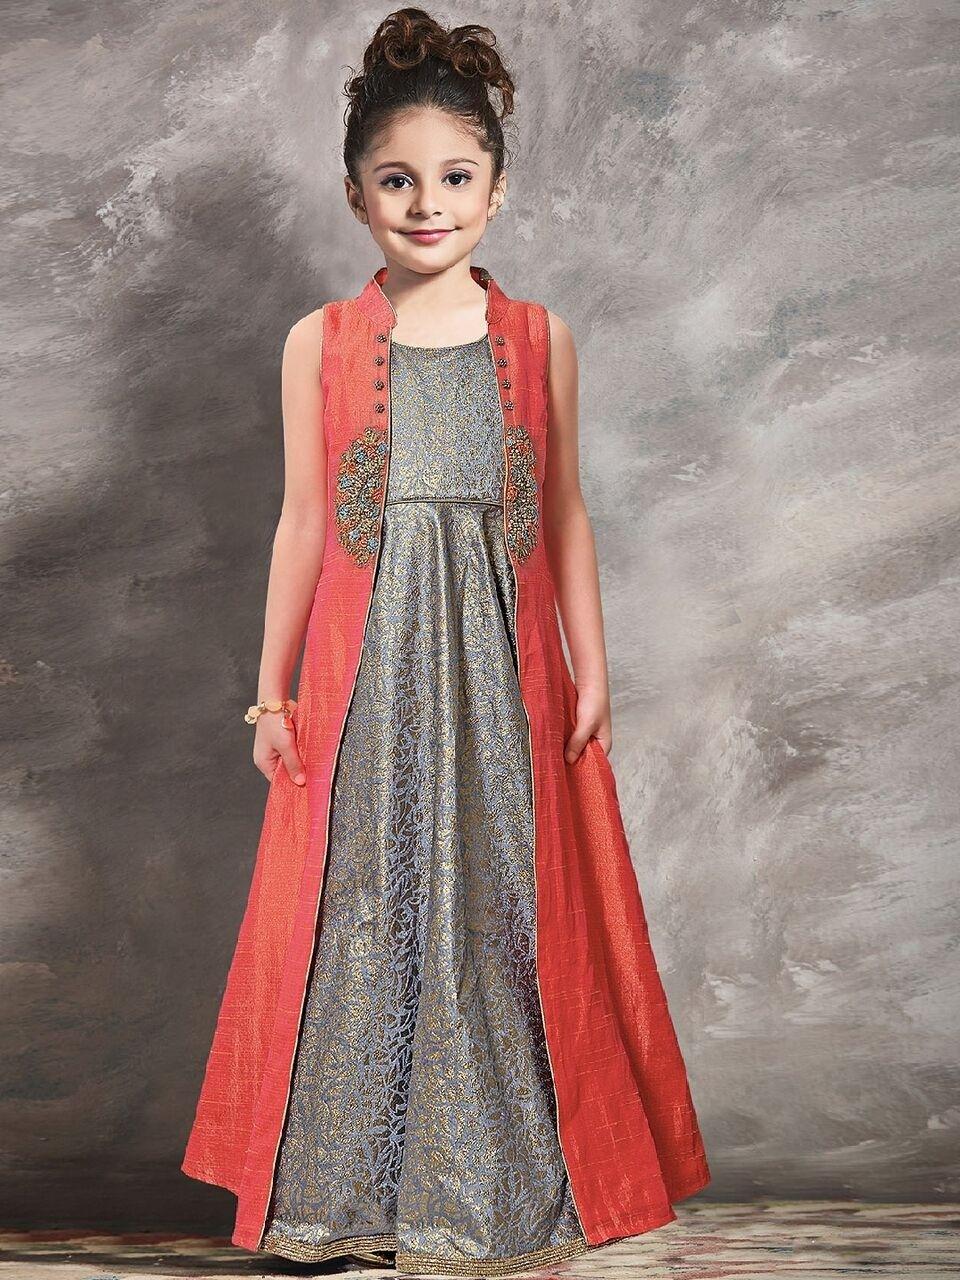 2590cf1143c23 Gowns For Girls, Little Girl Dresses, Cute Girl Dresses, Party Wear Dresses,